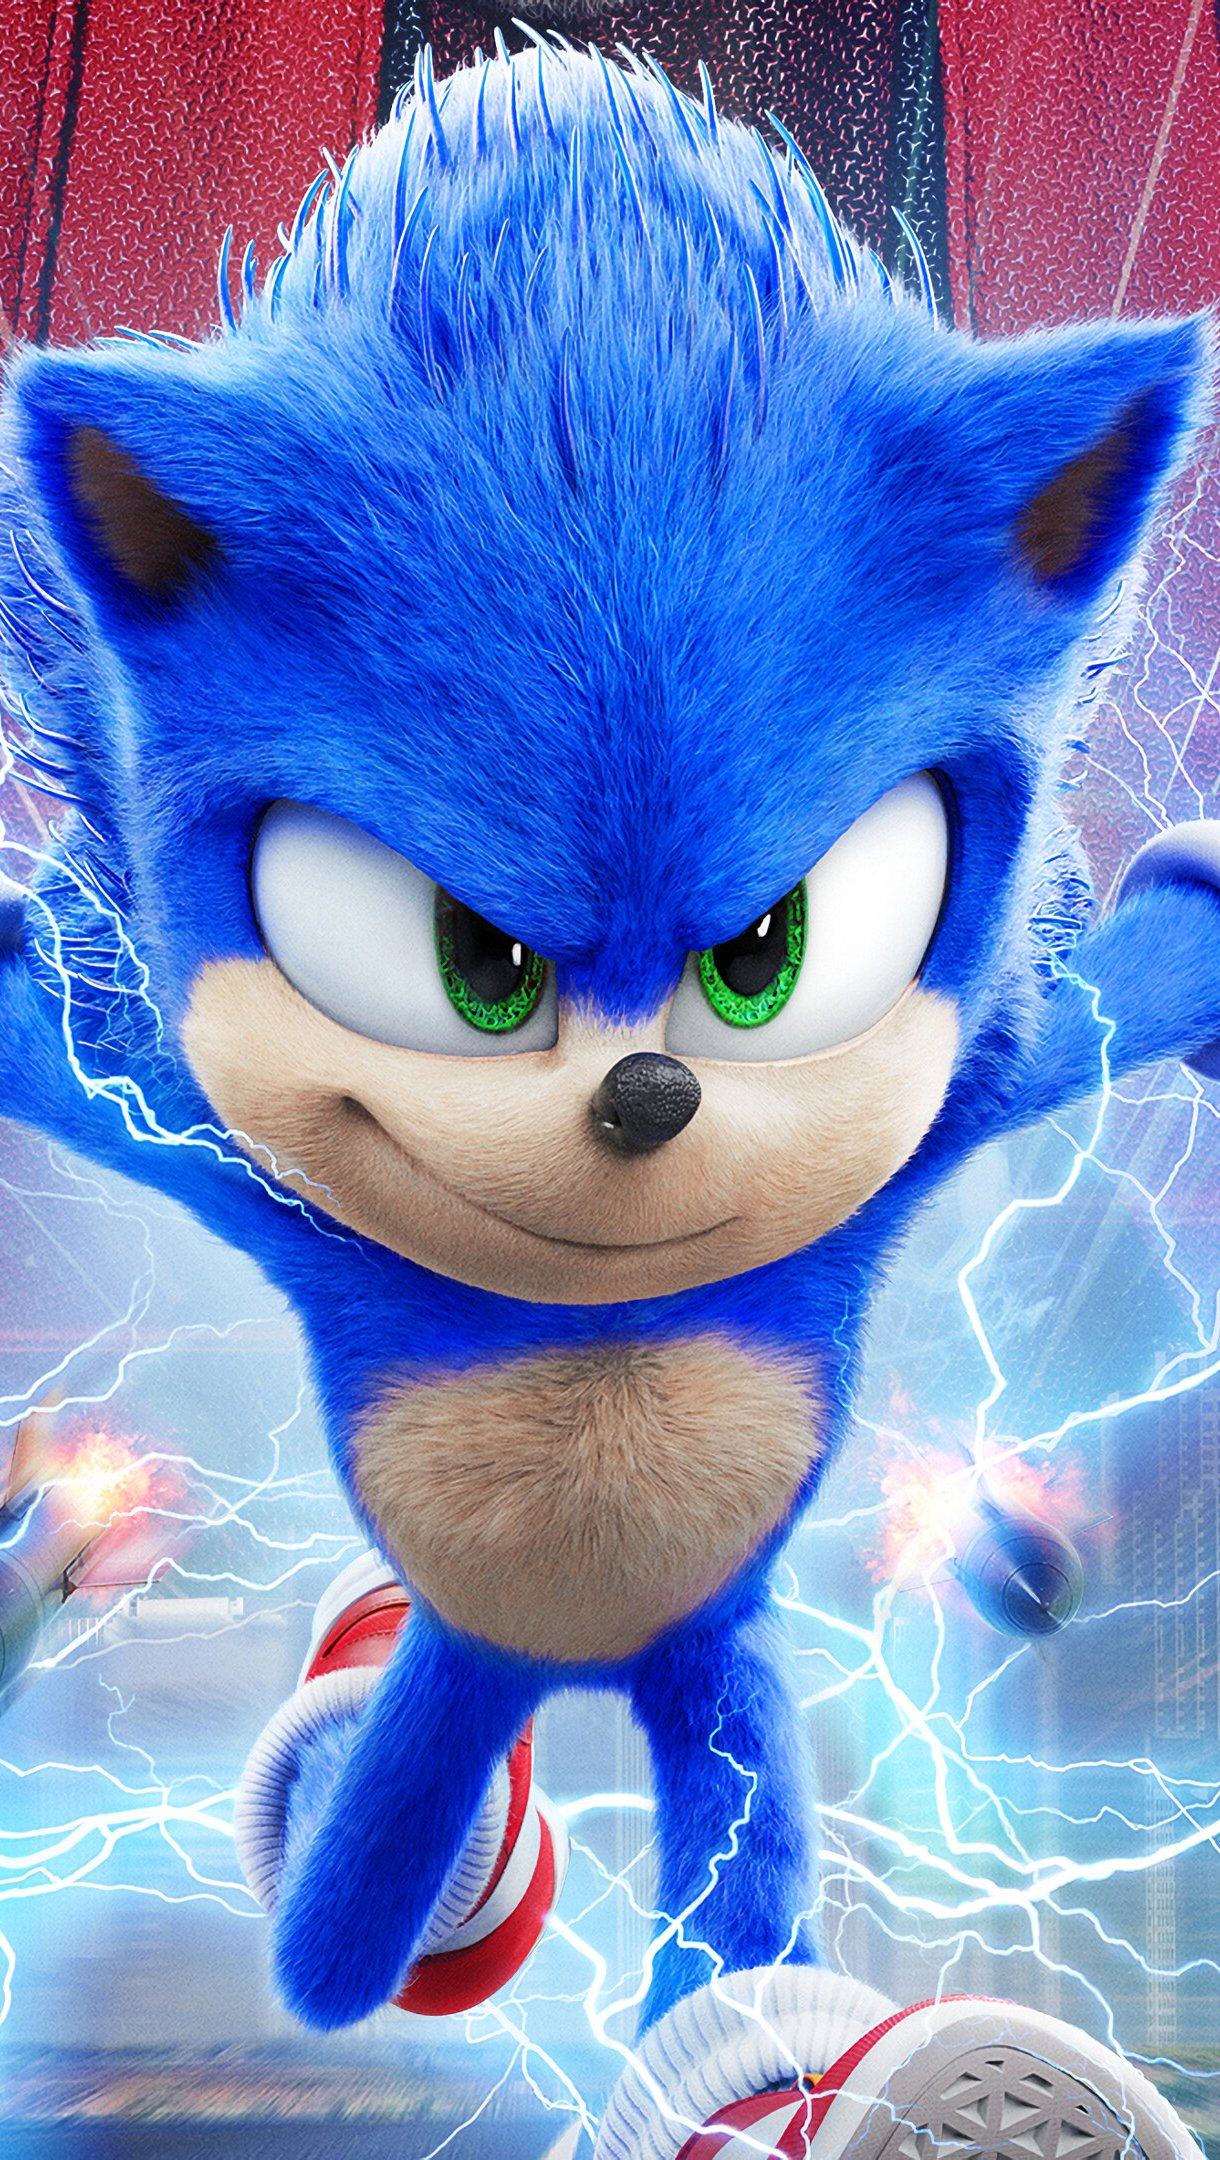 Fondos de pantalla Sonic the Hedgehog Poster de Película Vertical